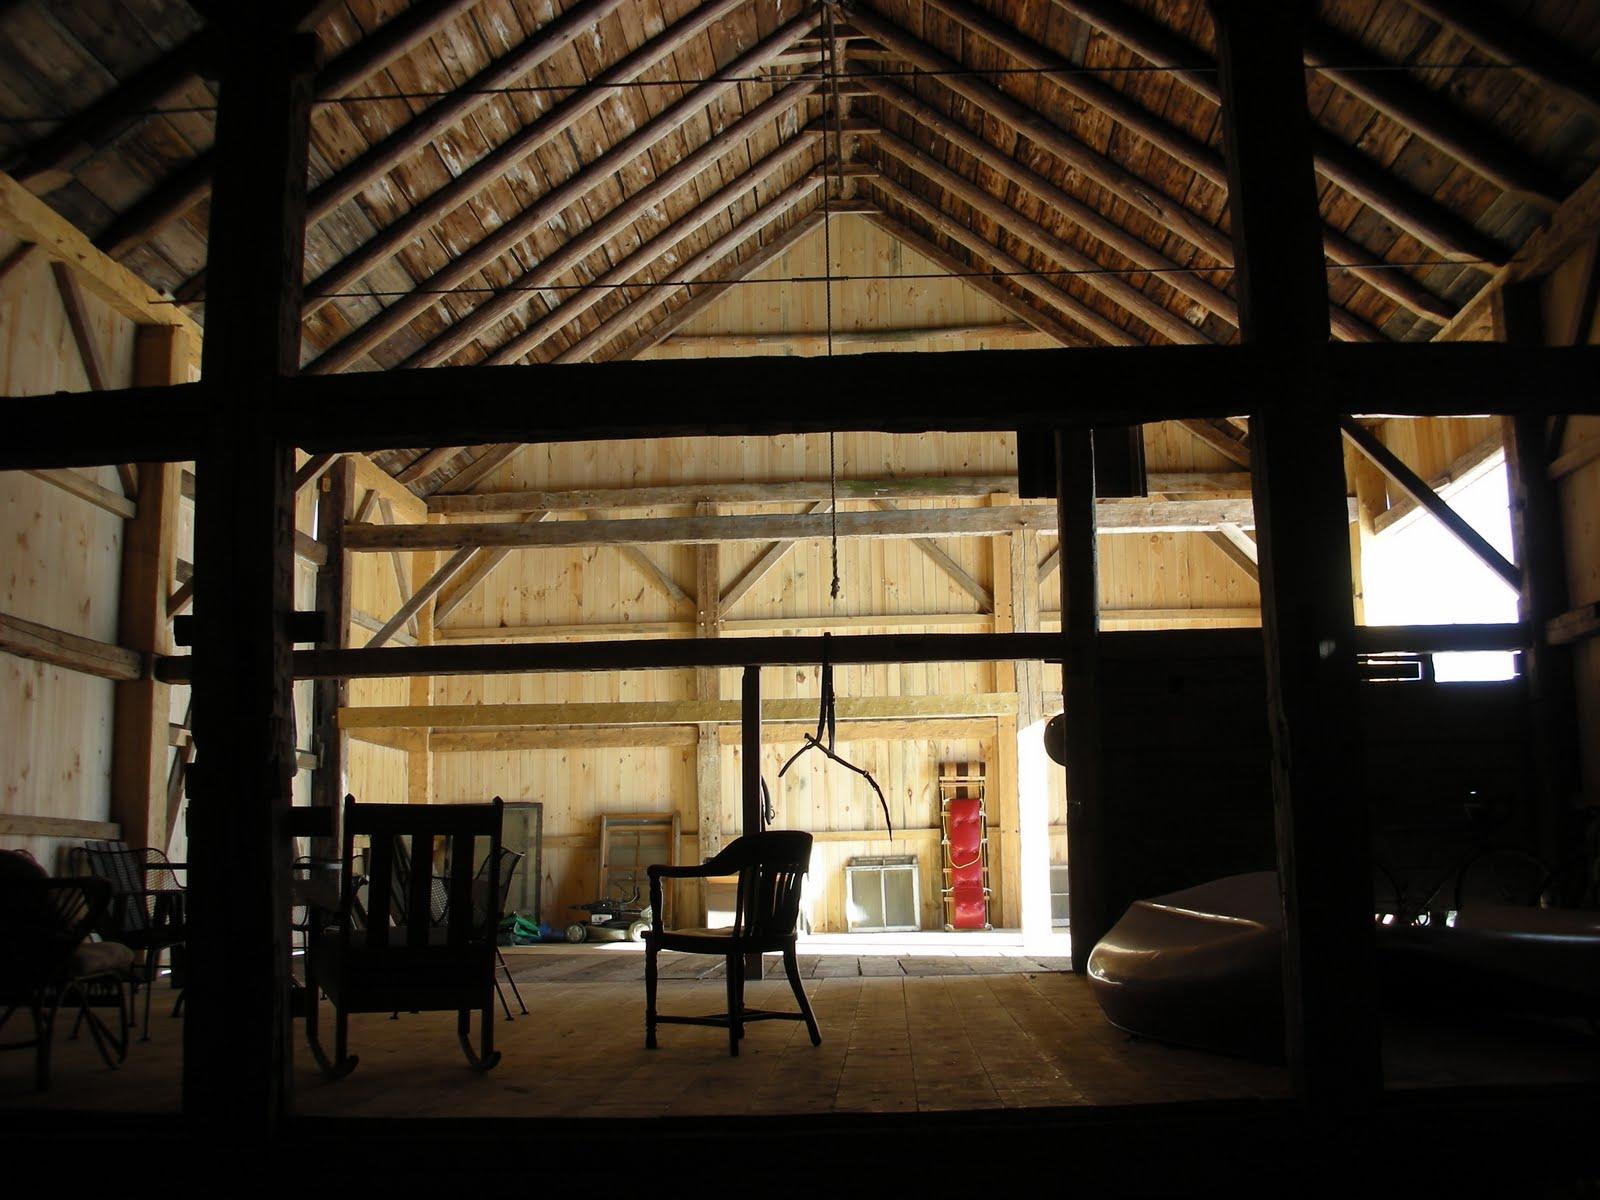 whitcomb barn